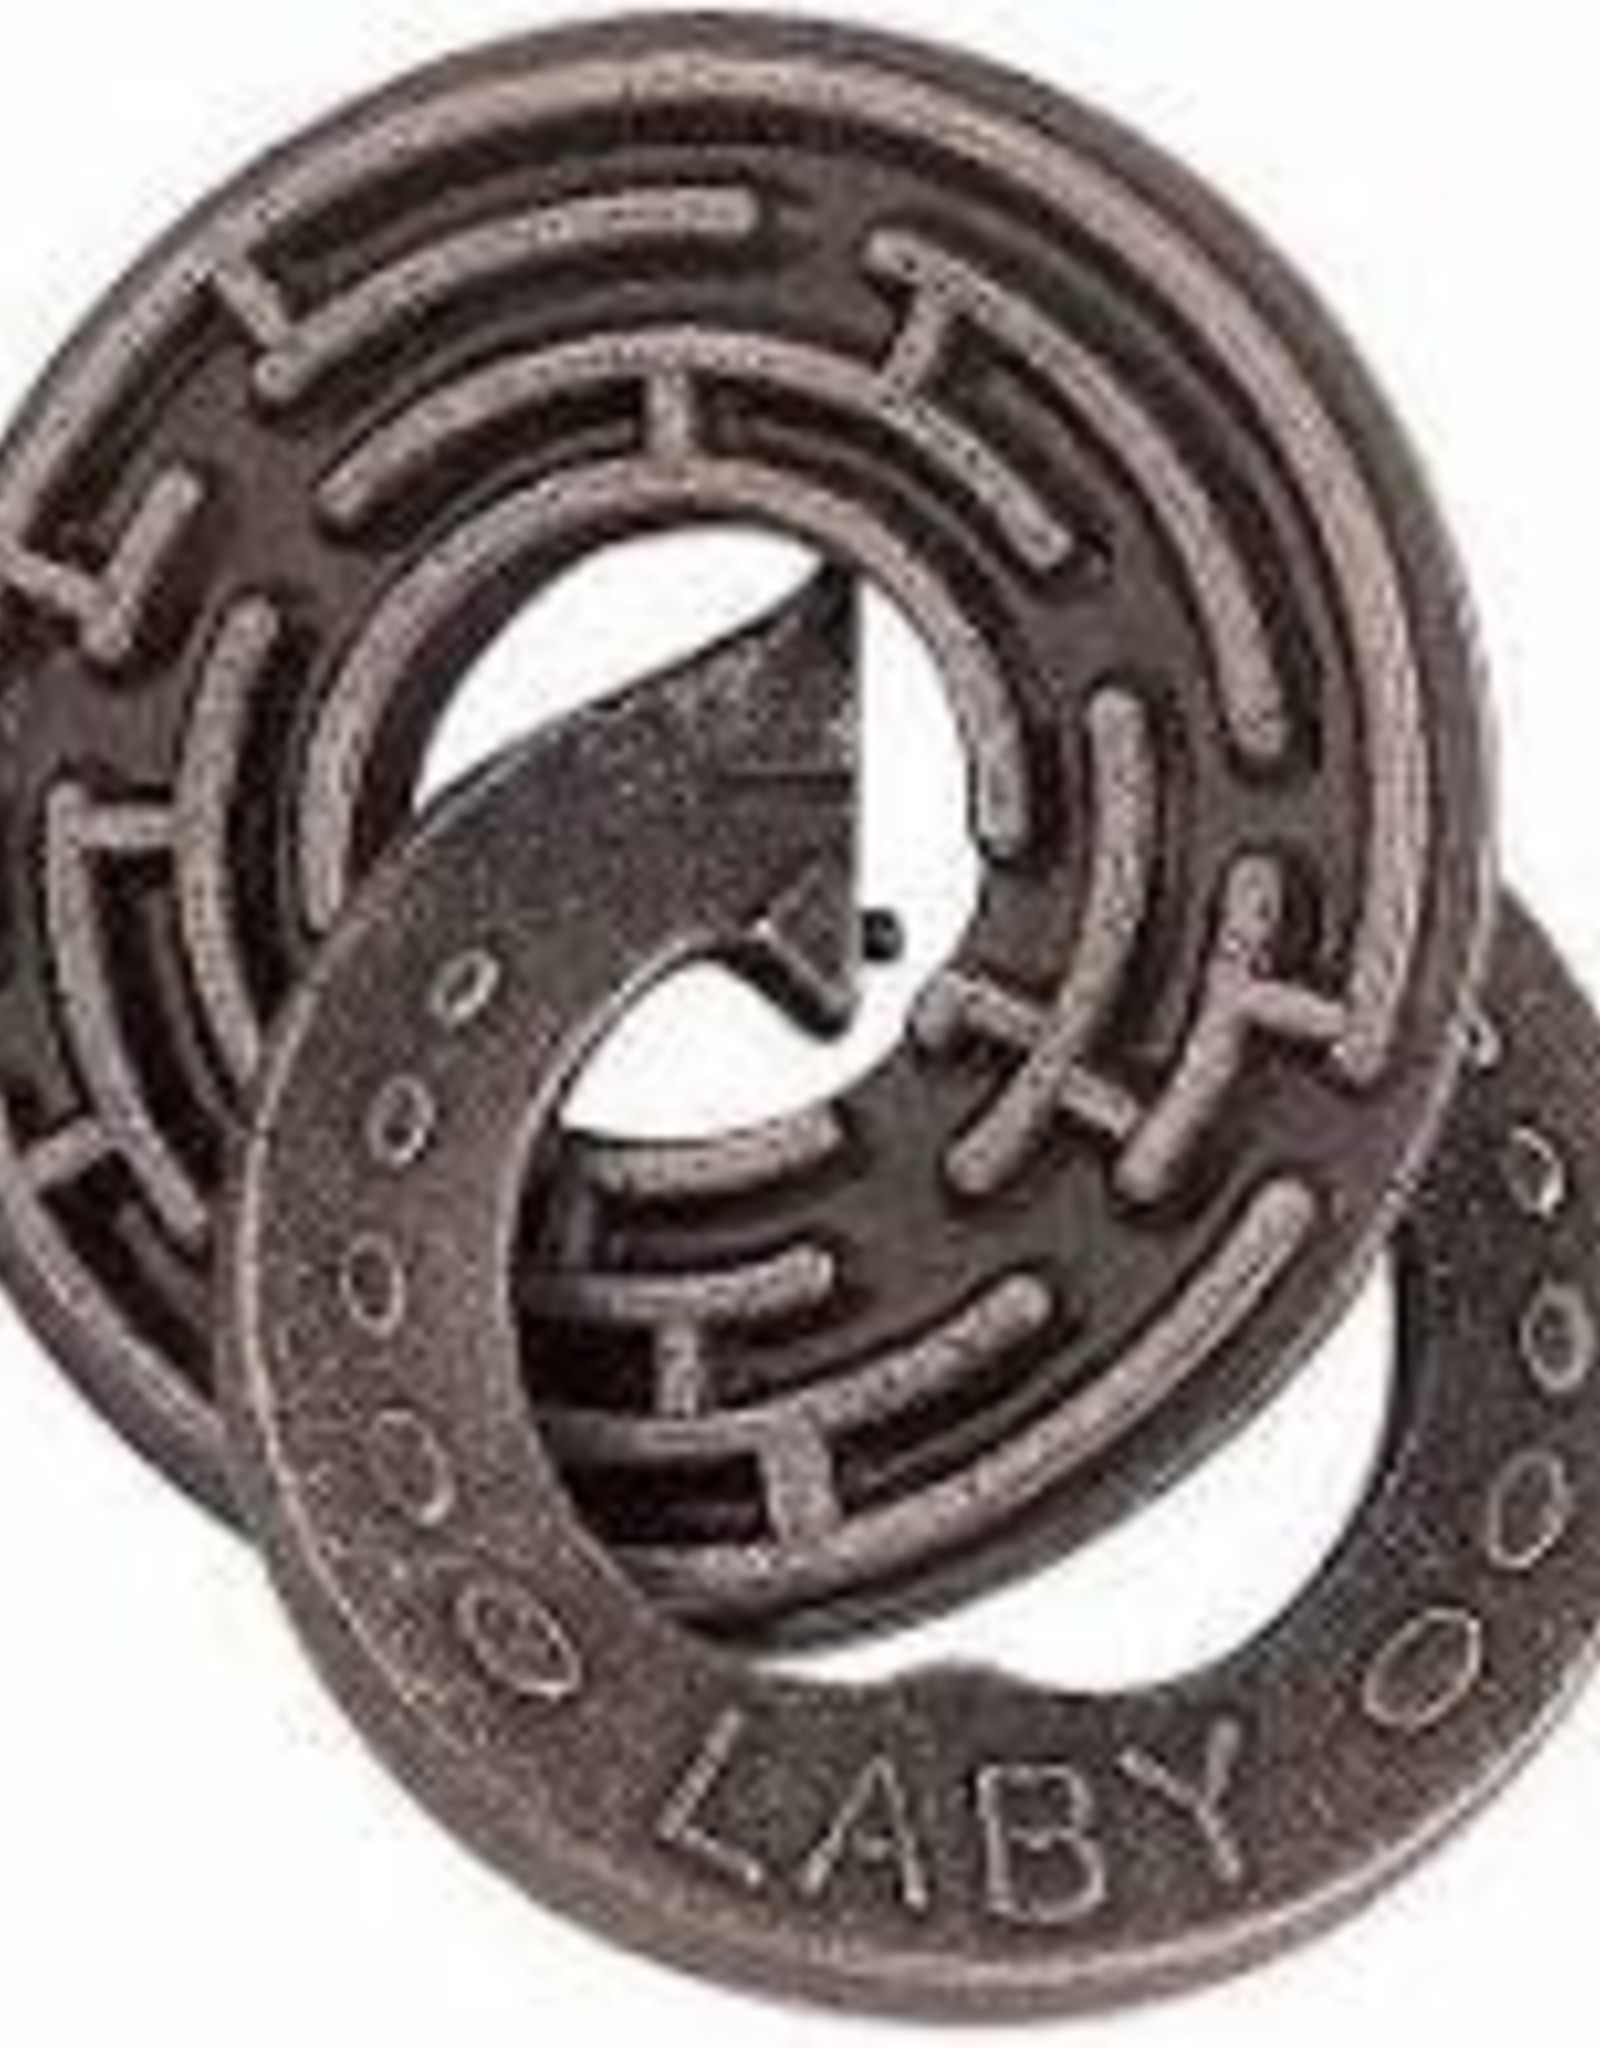 HANAYAMA Labyrinth - Level 5